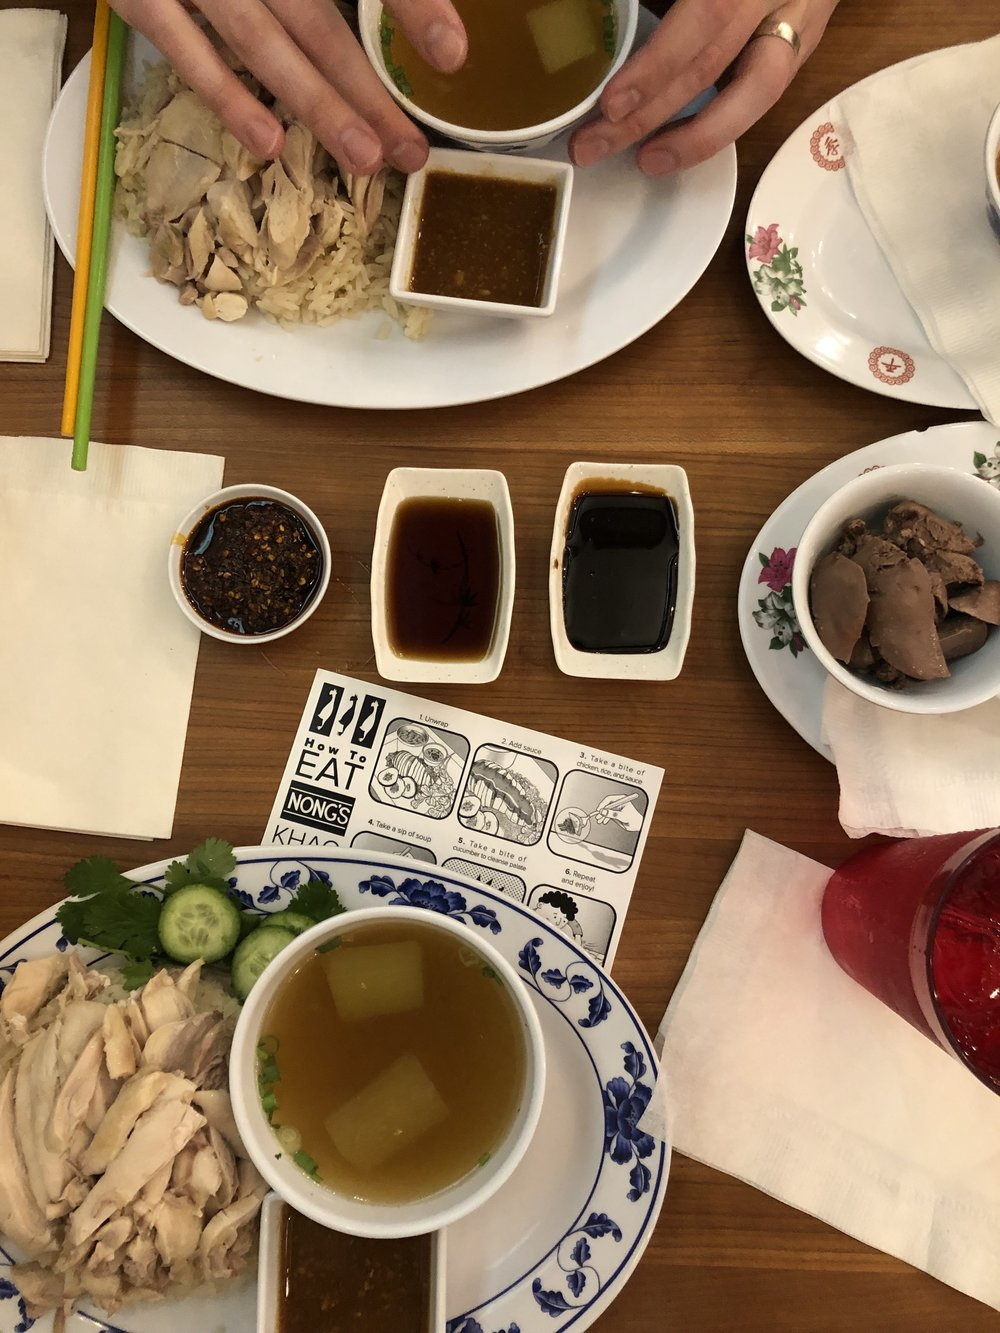 Chicken, Rice, and Liver at Nong's Khao Man Gai